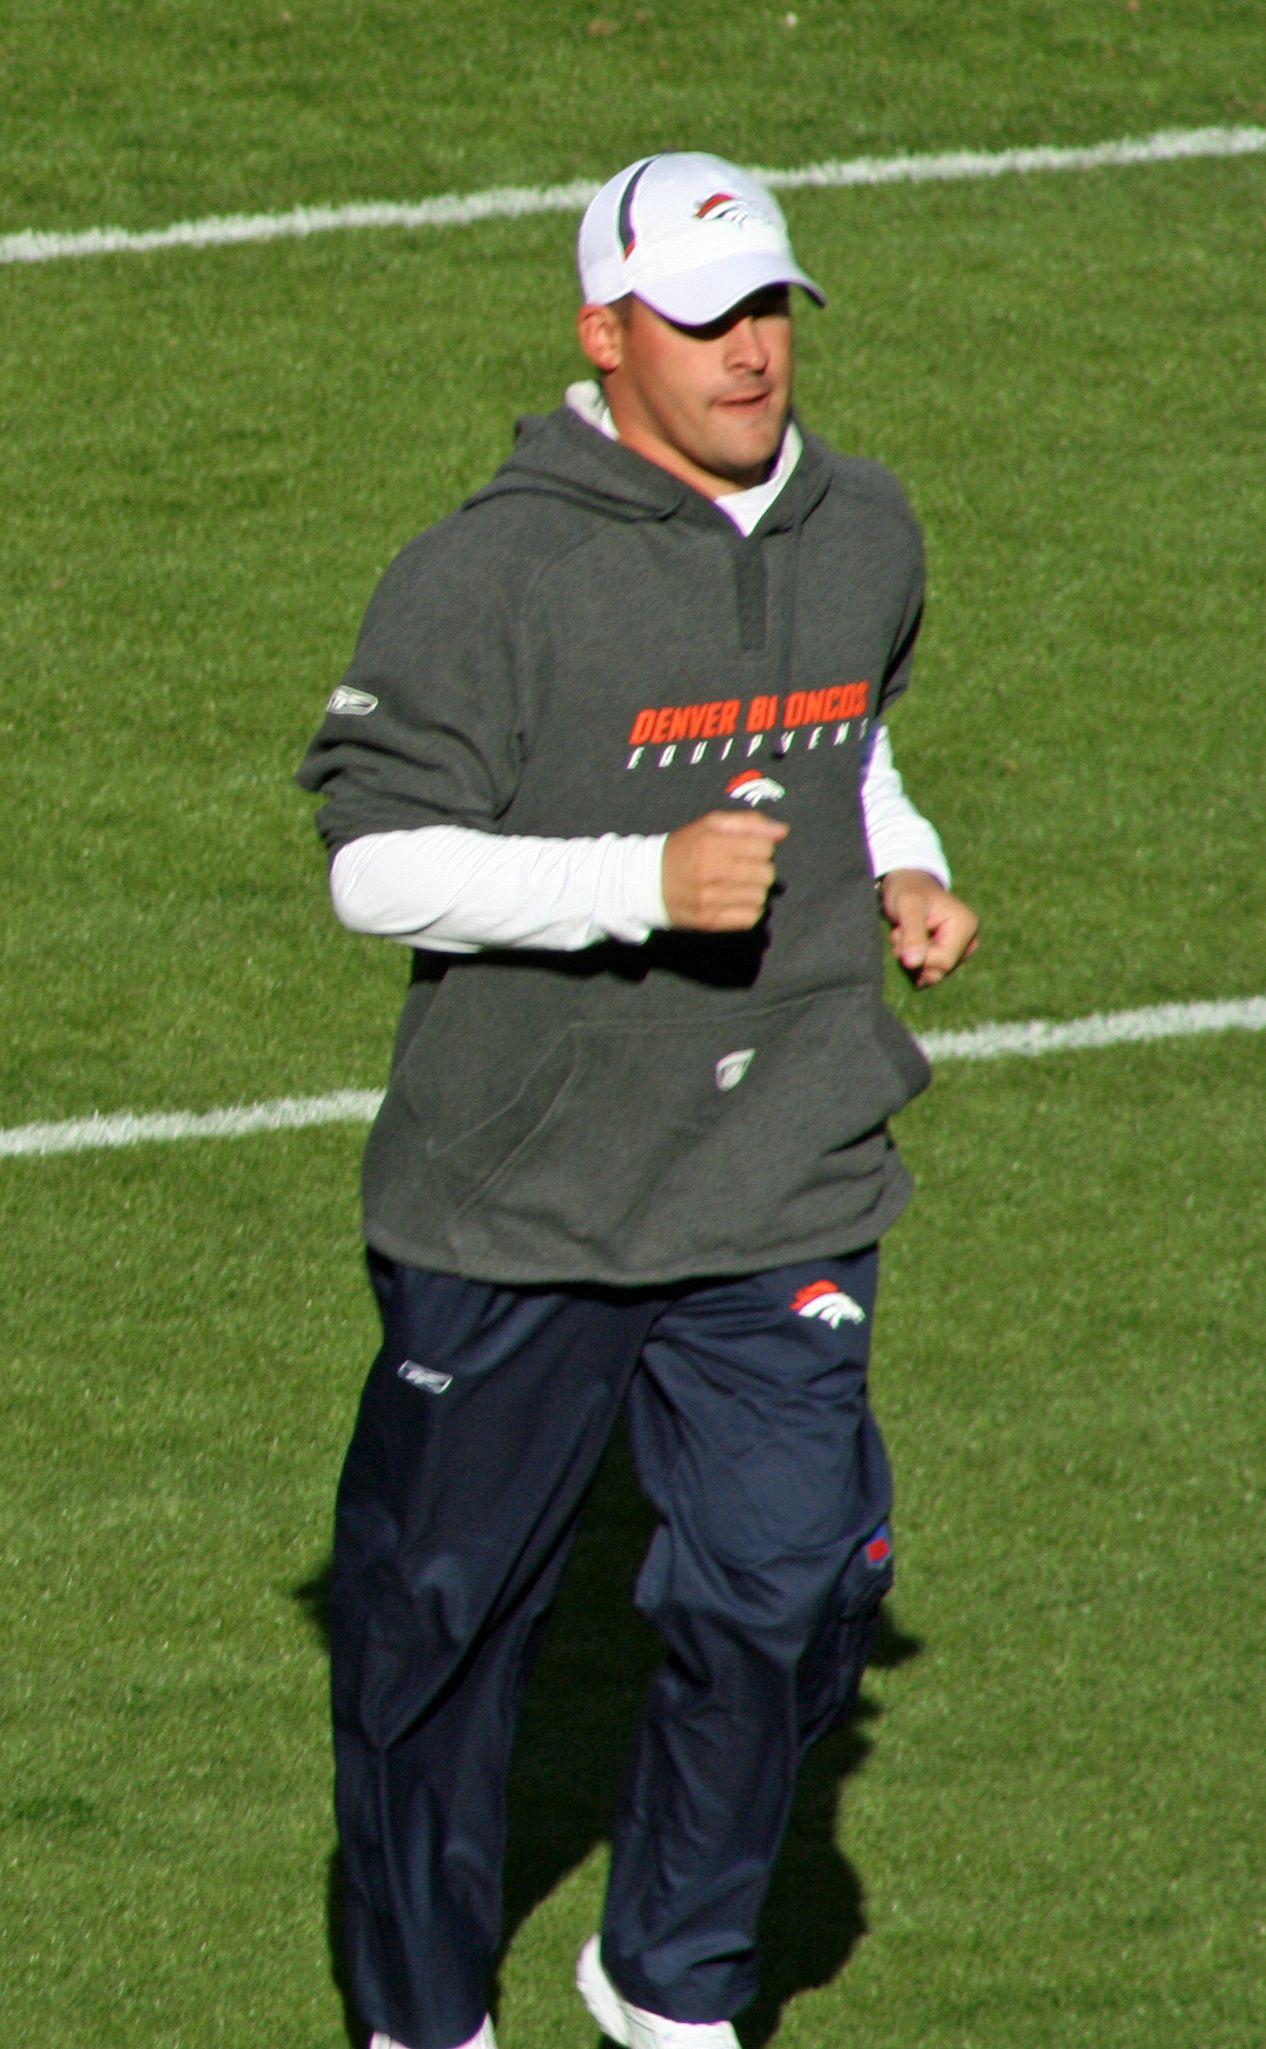 Mayhem reccomend Coach mike sirianni is a dick